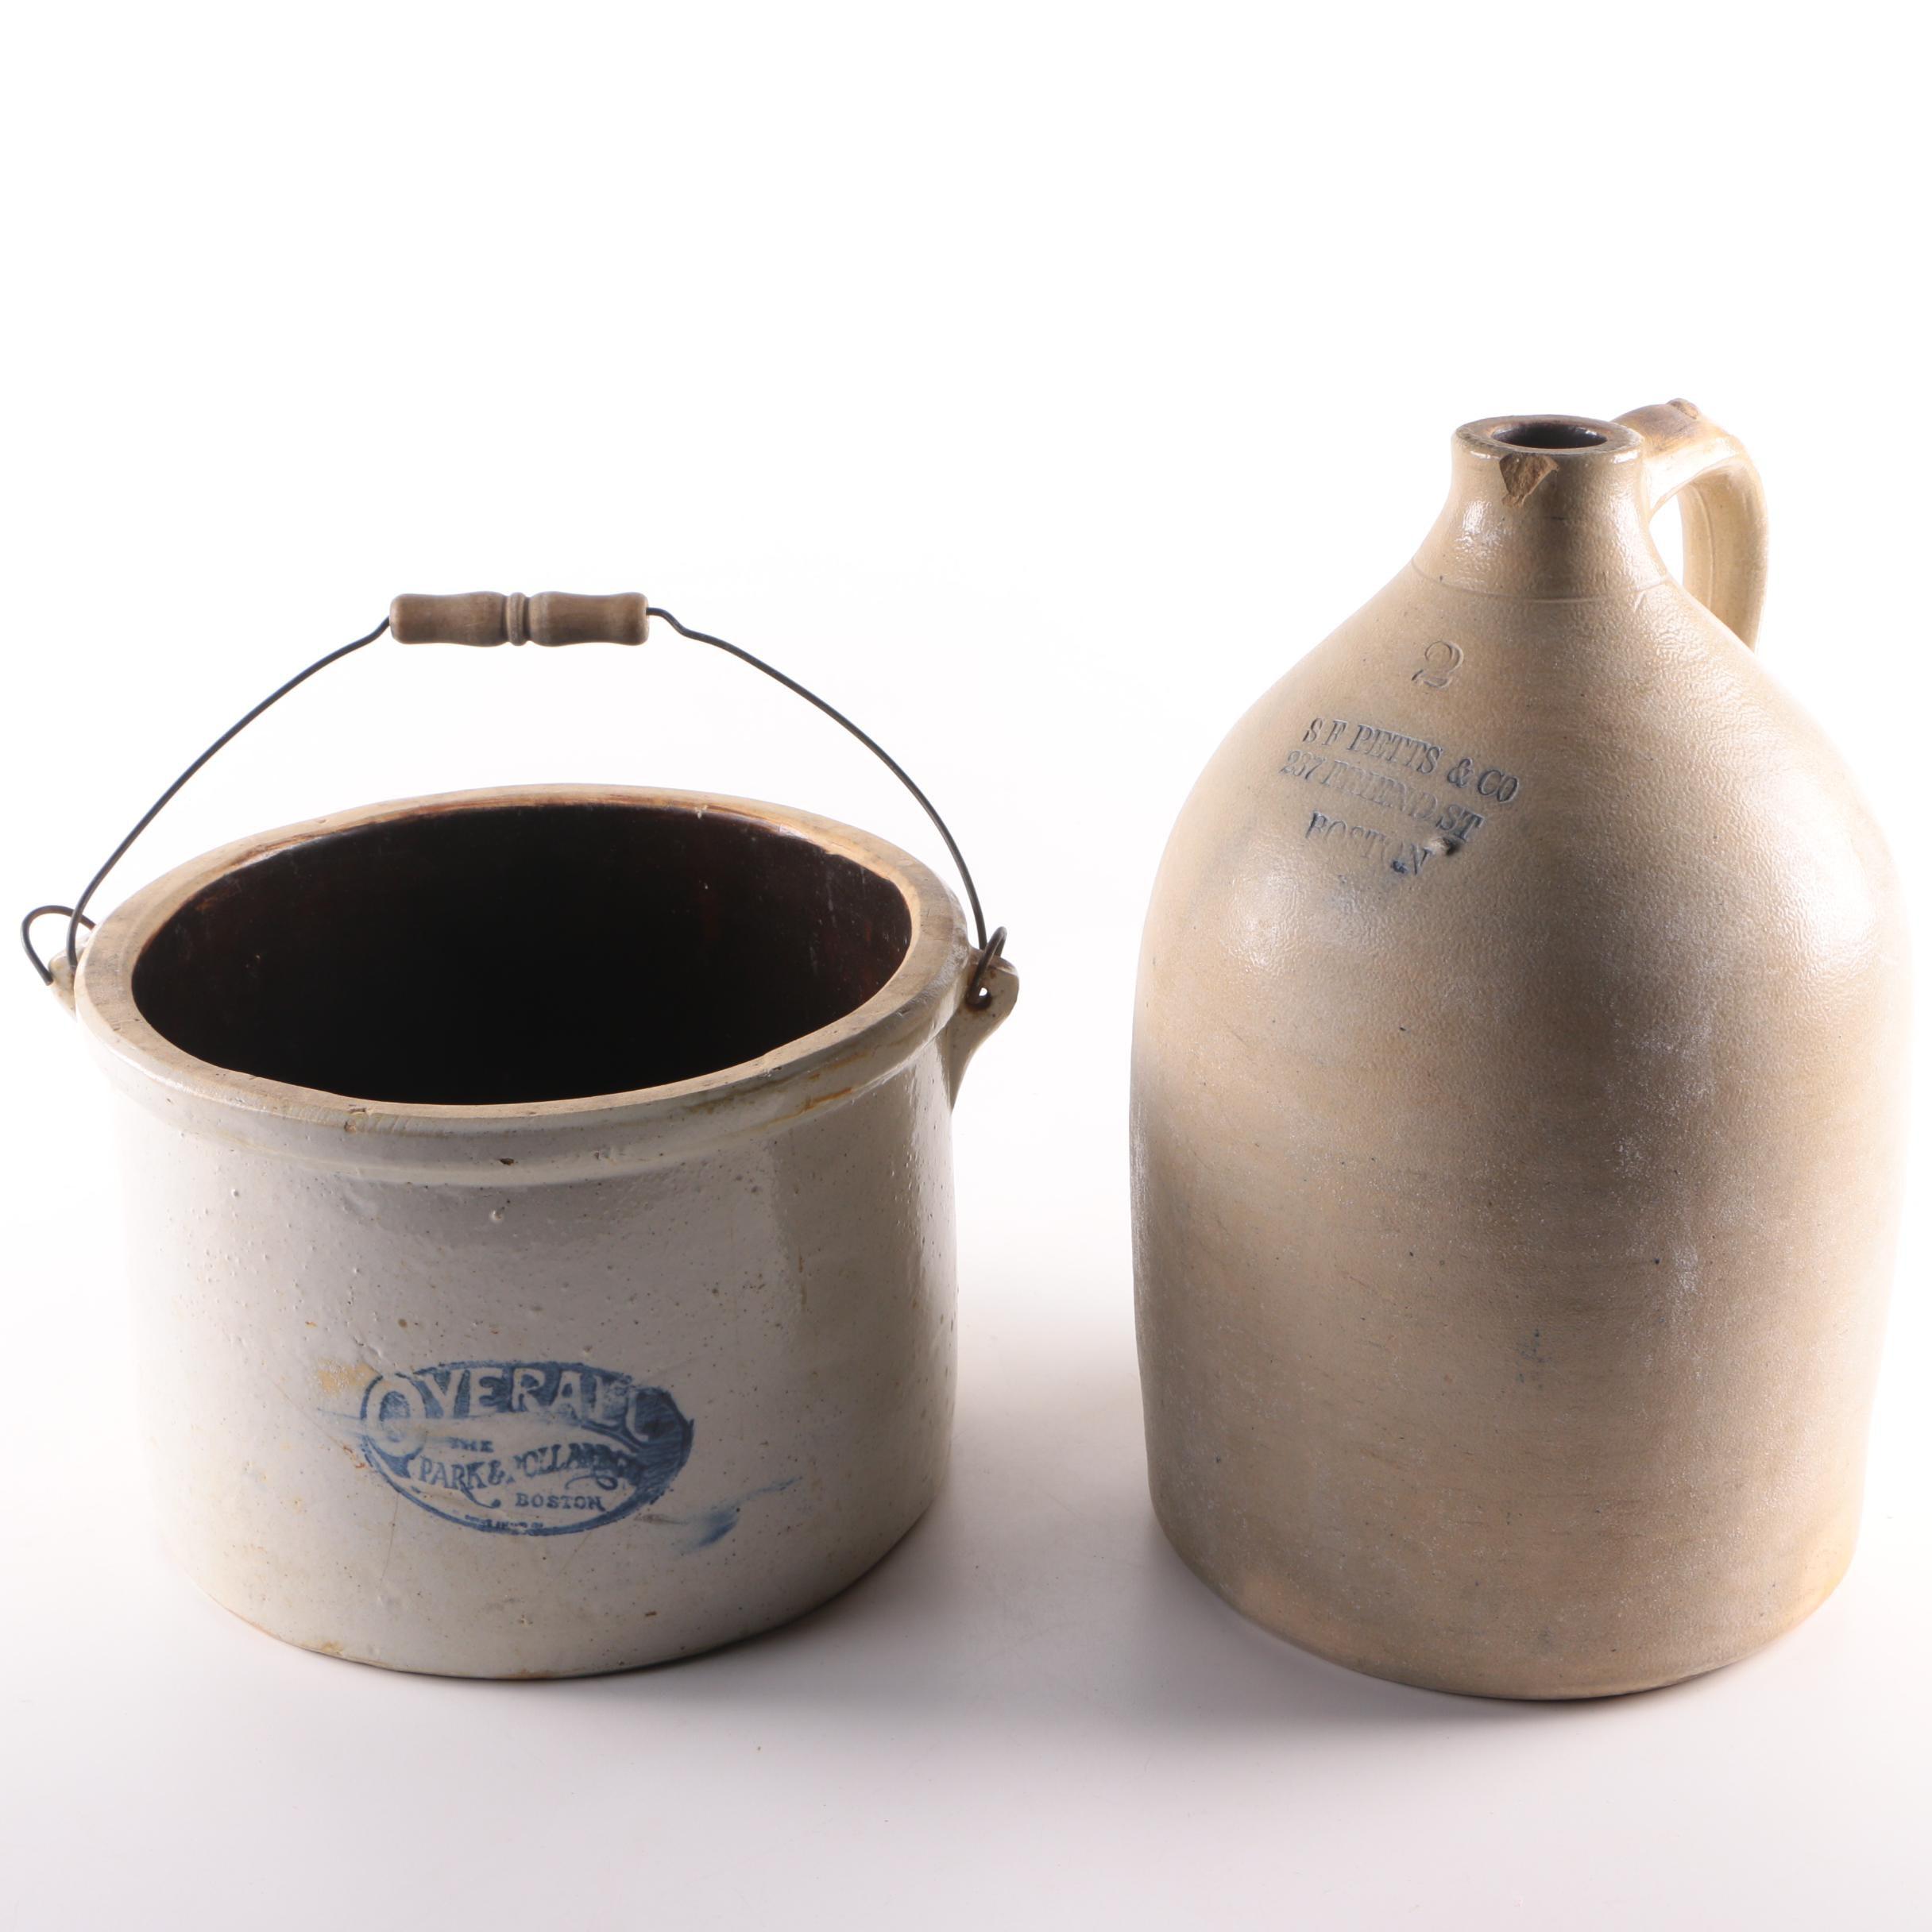 Vintage Stoneware Jug and Crock